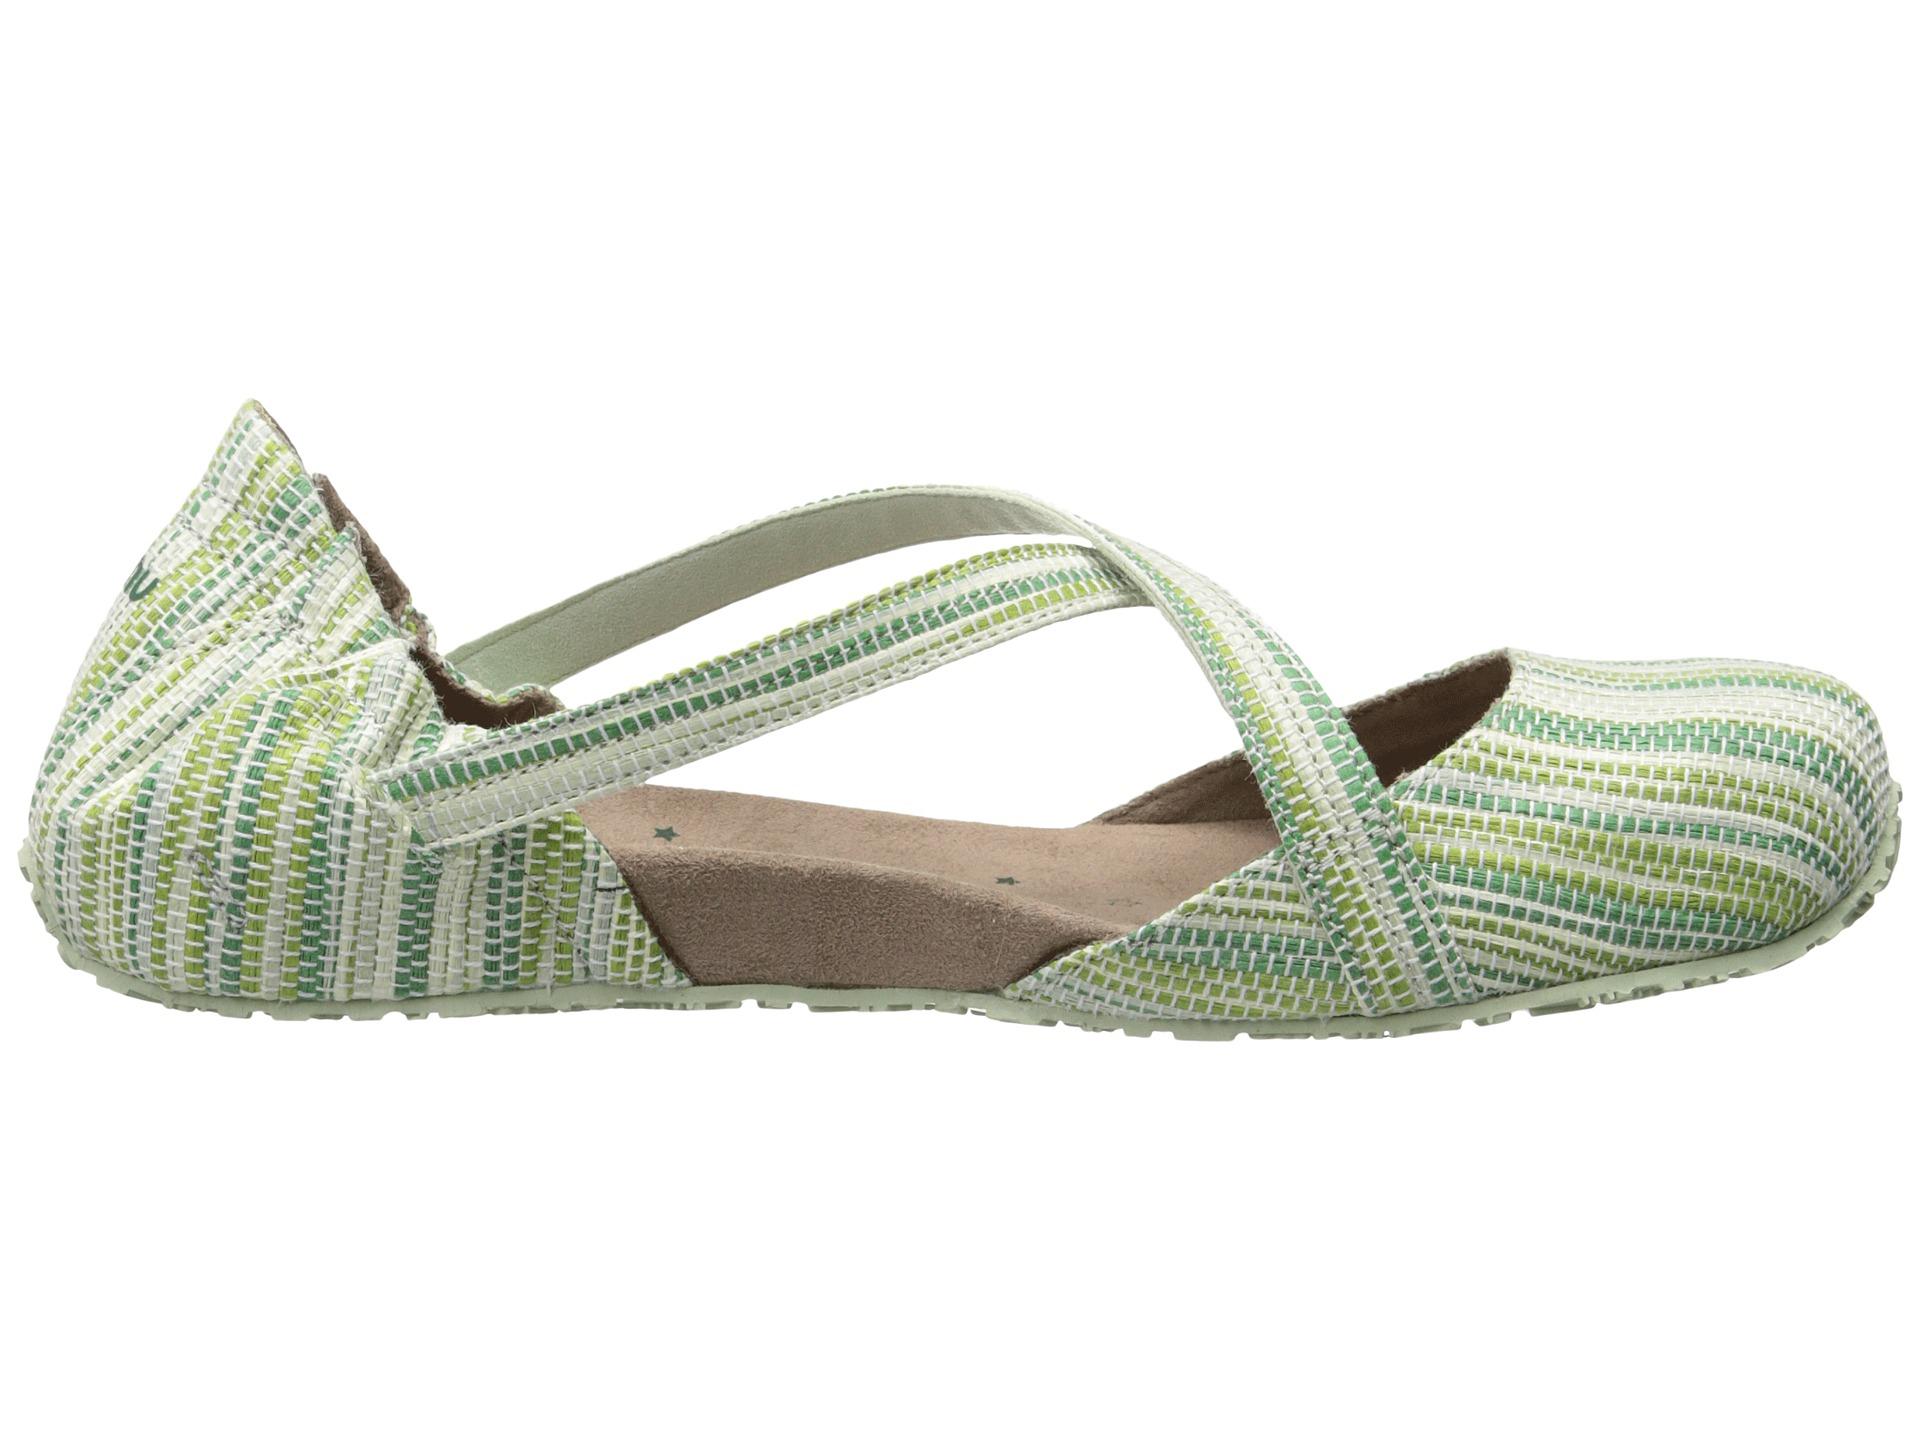 c6be11c9260bb1 Lyst - Ahnu Karma Textile - Usa in Green